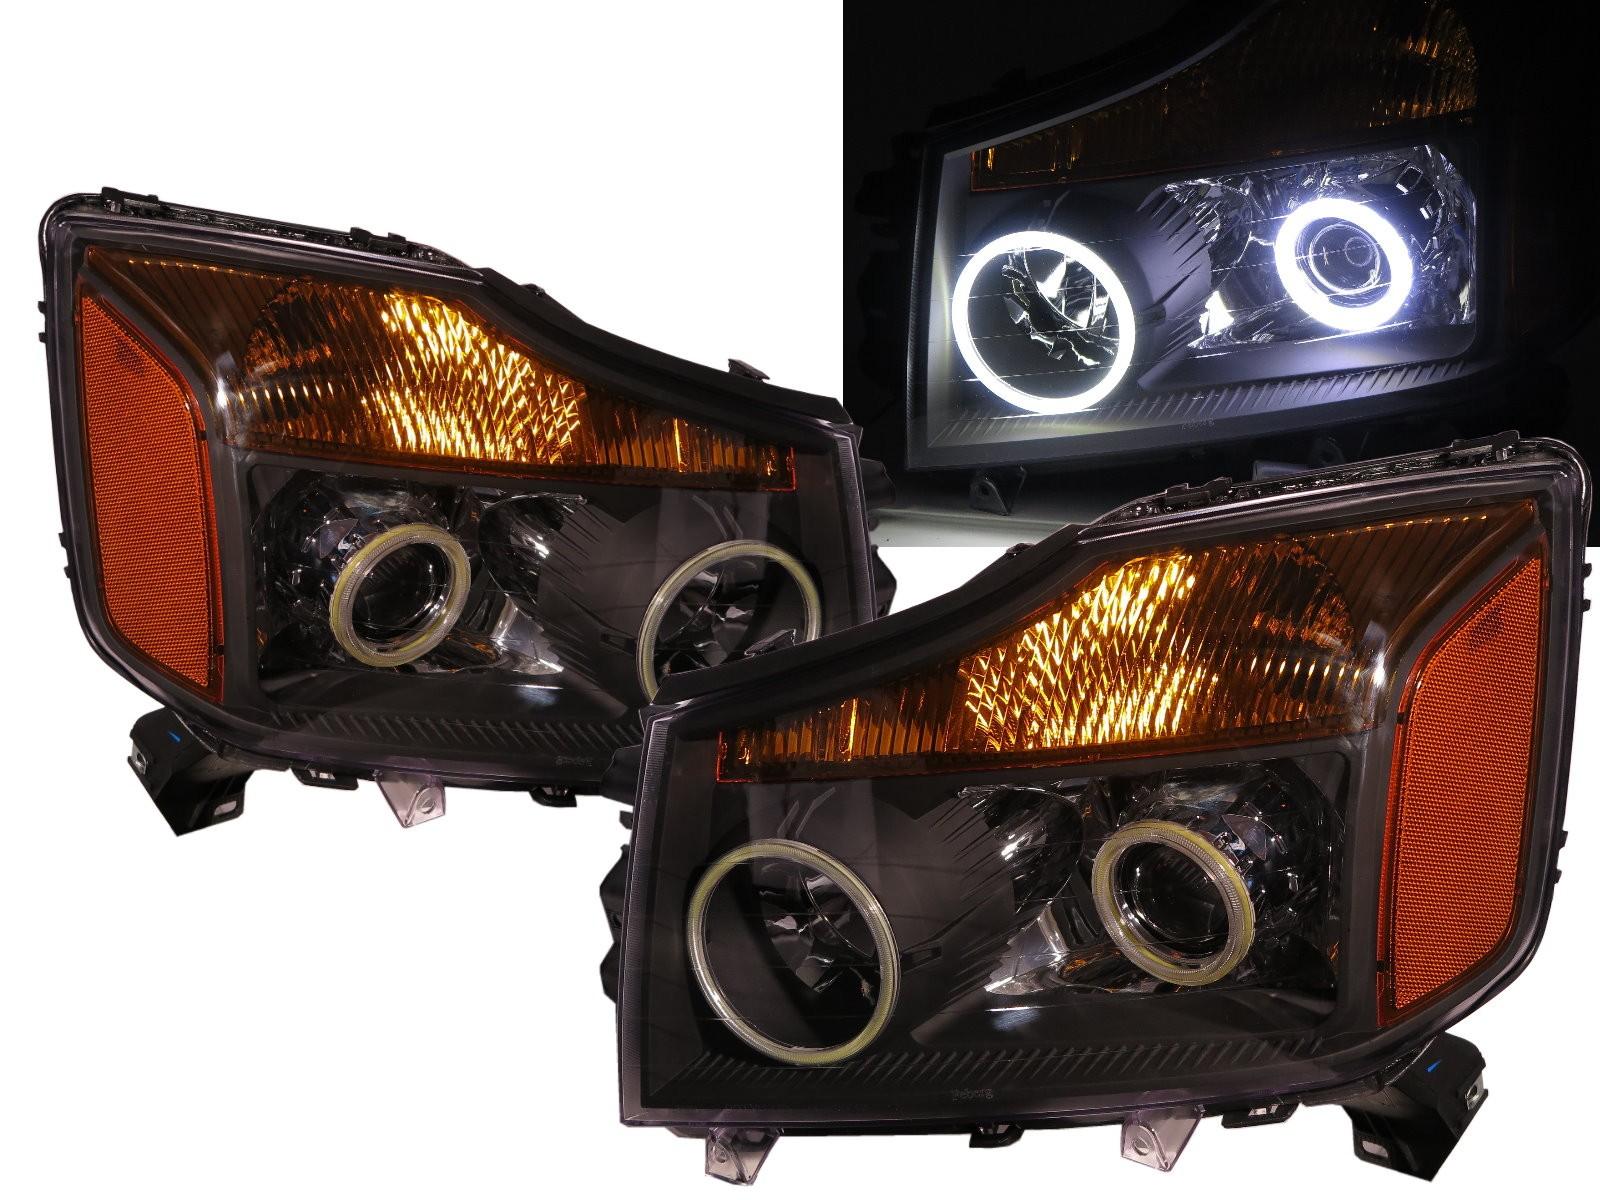 CrazyTheGod Armada WA60 First generation 2004-2007 SUV COB Projector Headlight Headlamp Black for NISSAN RHD